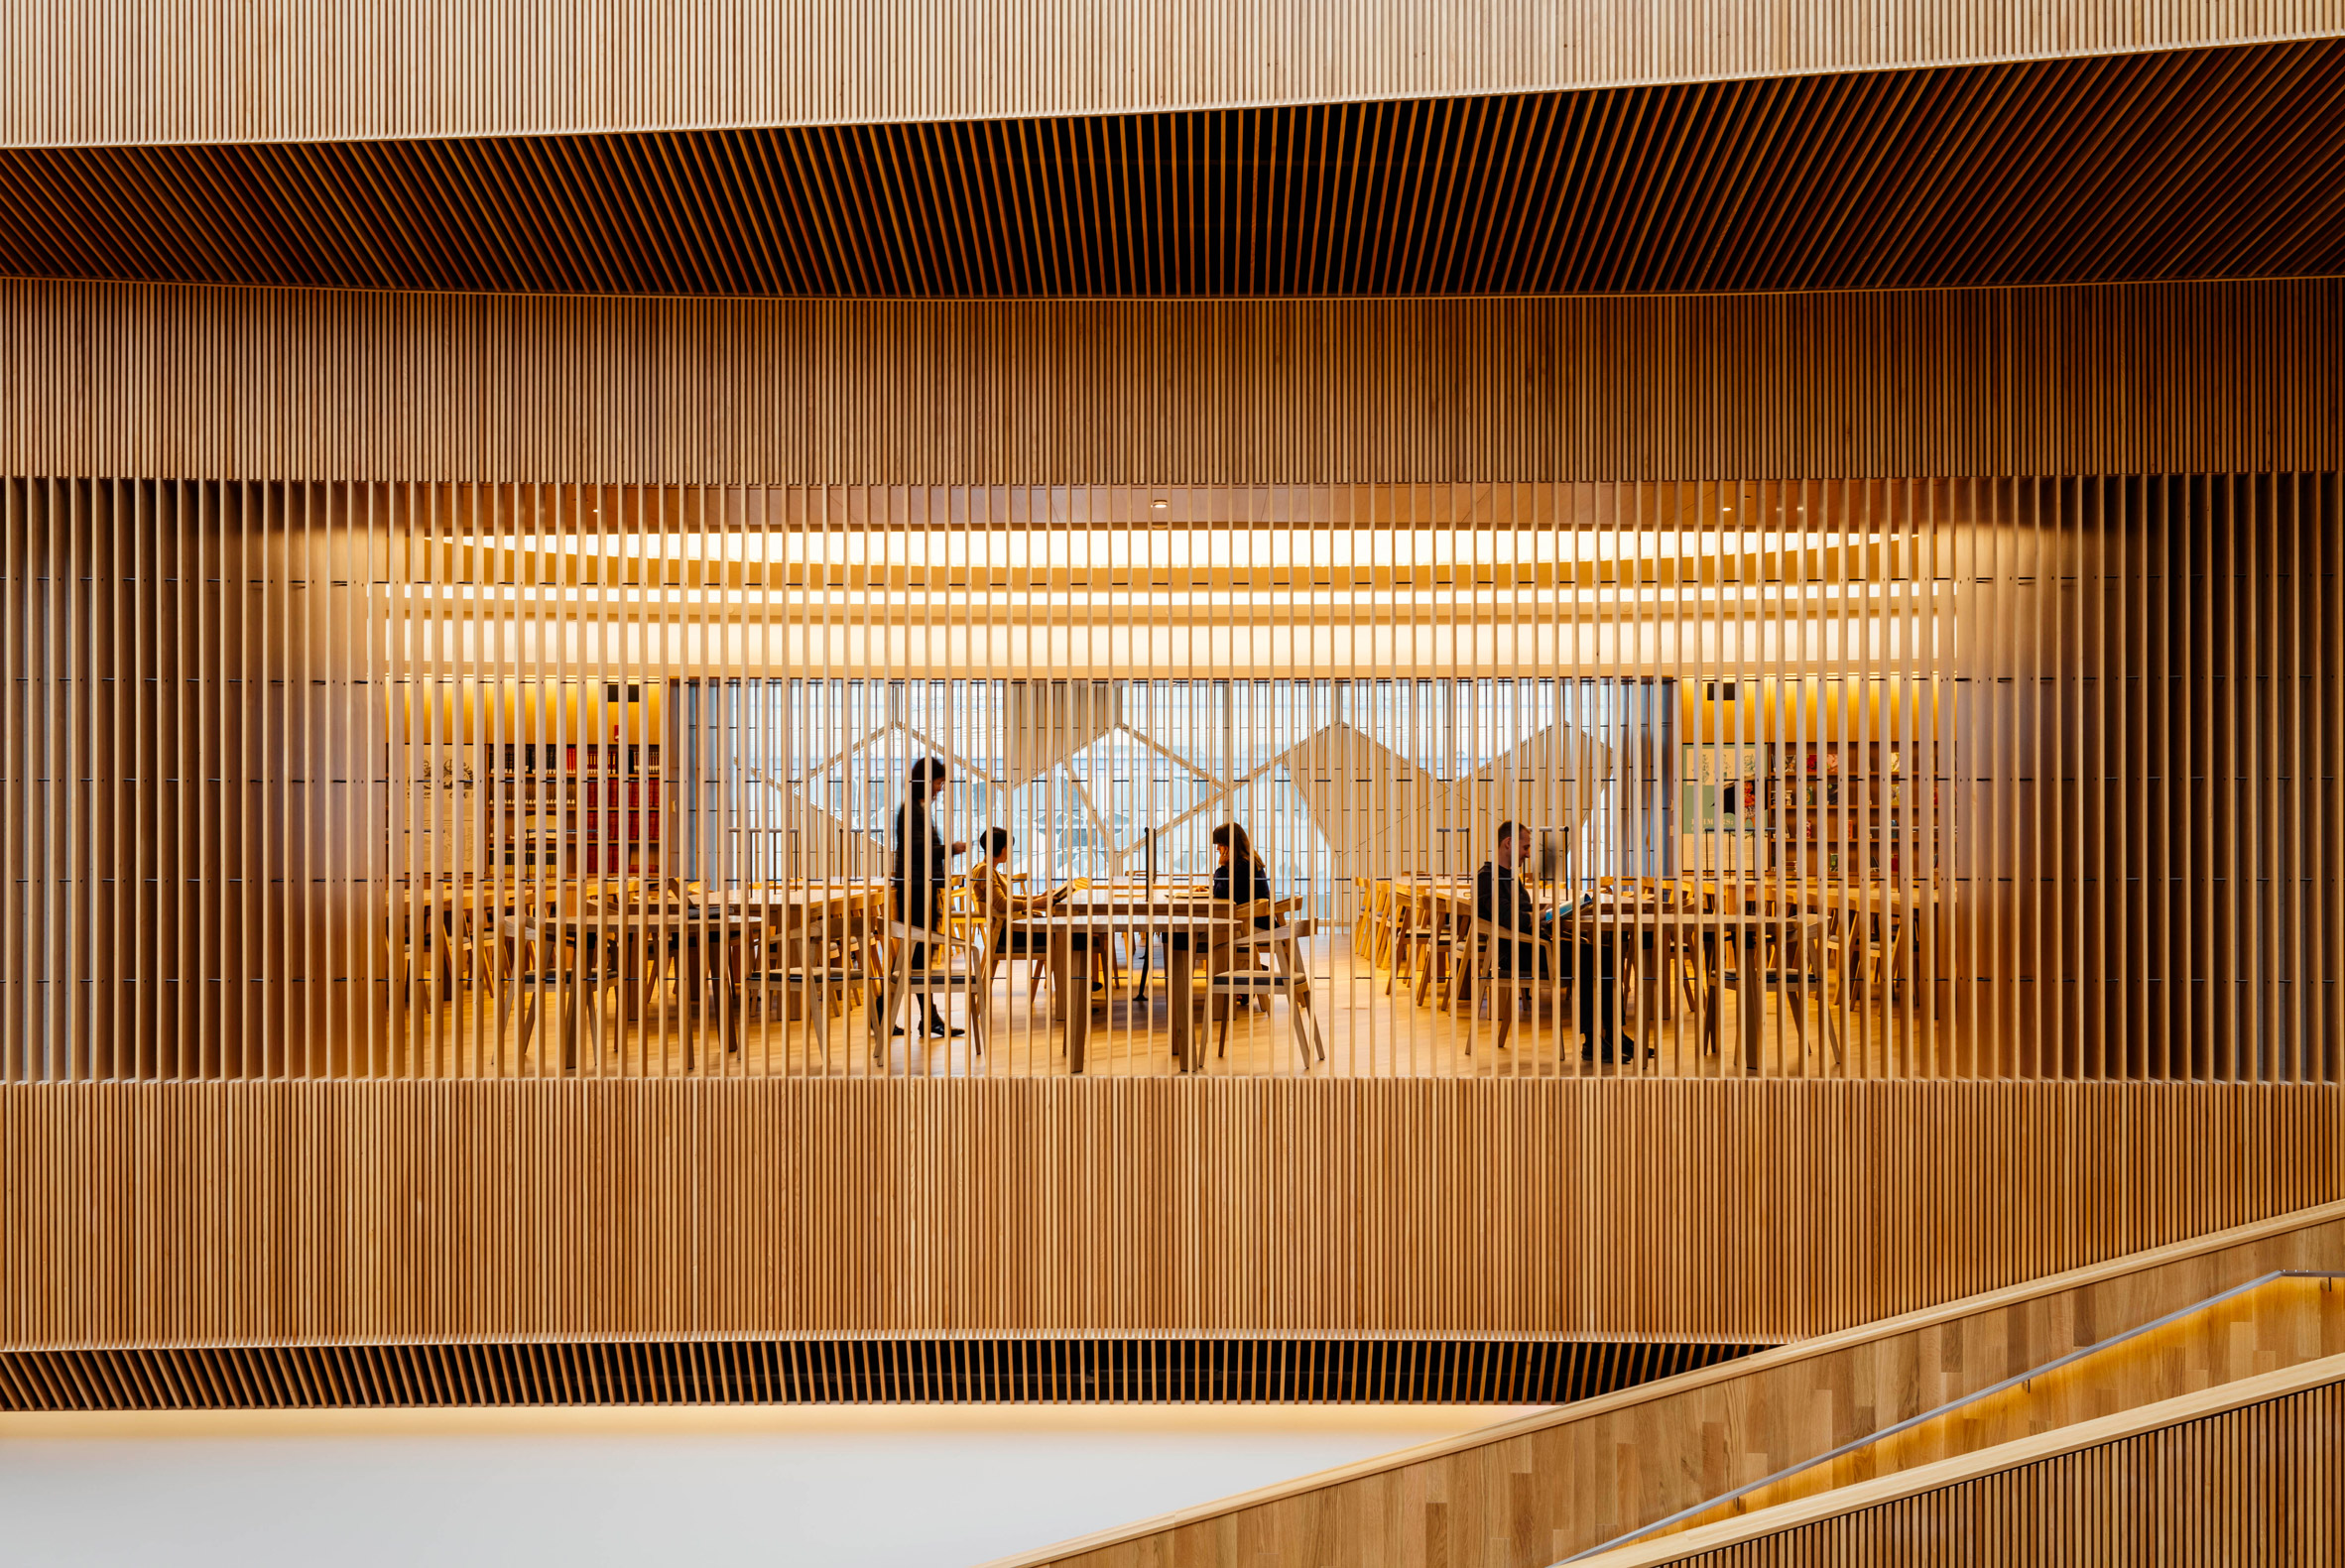 thư viện calgary elledecoration vn 5